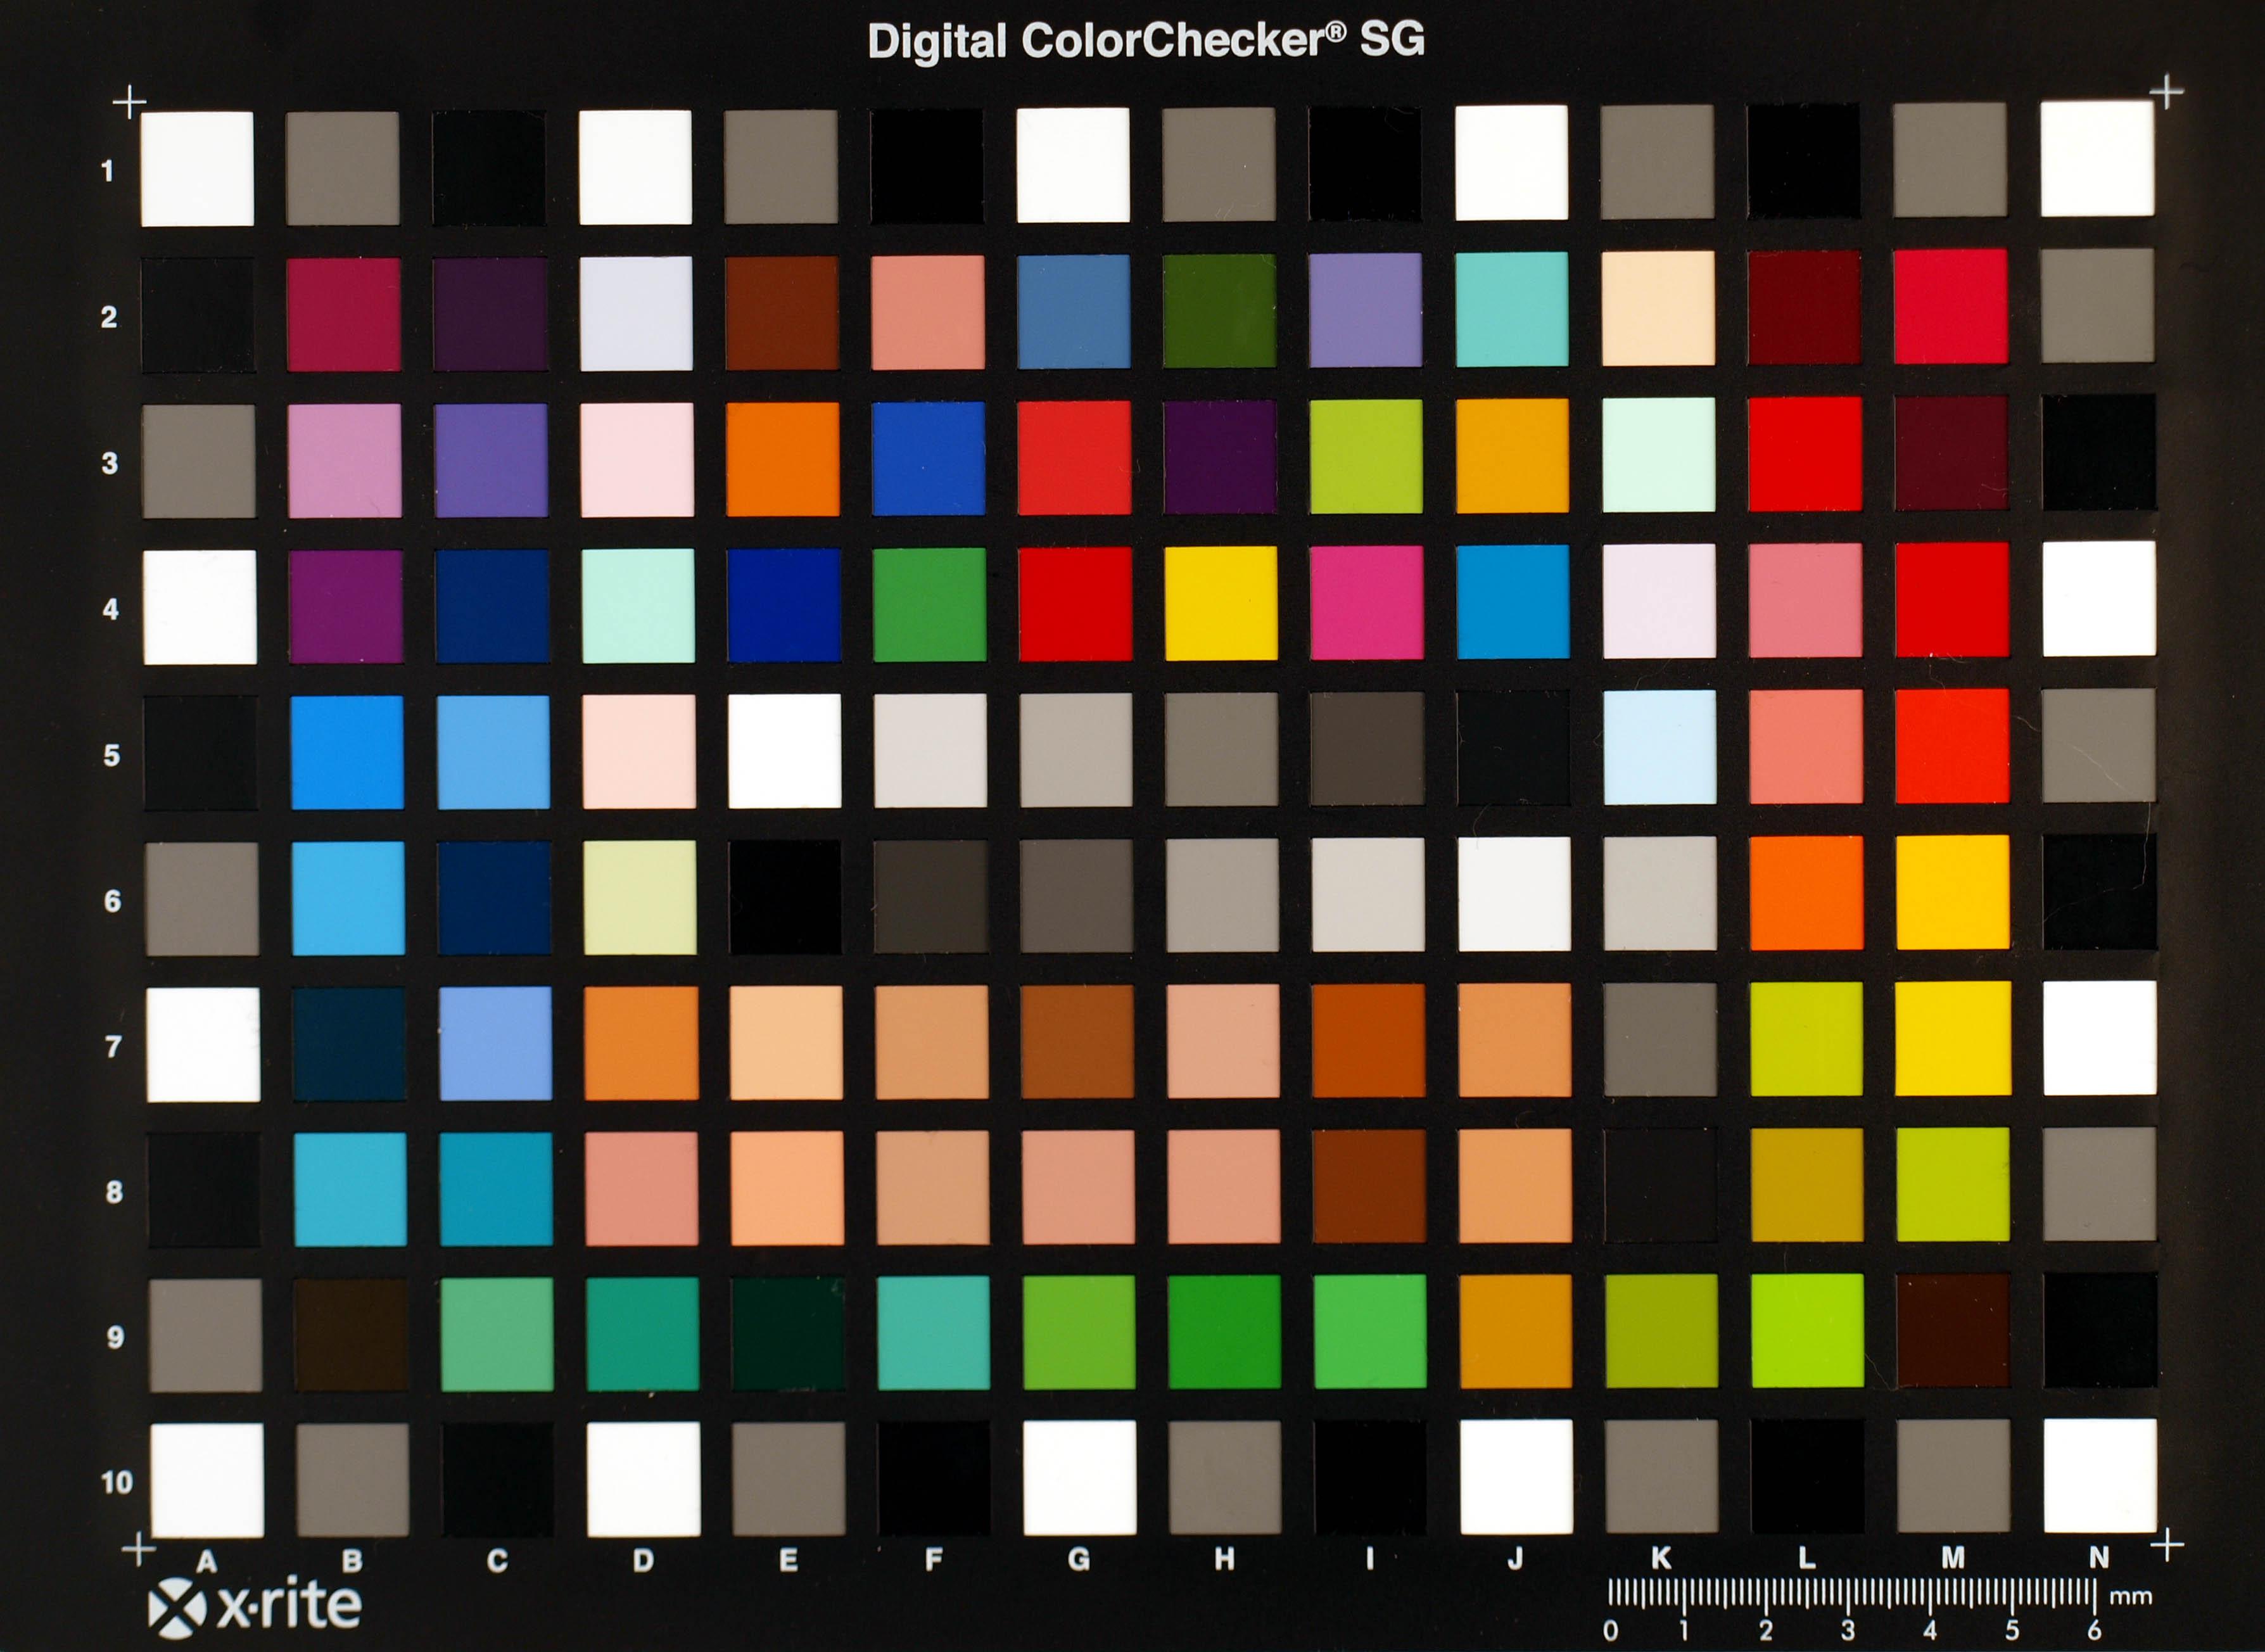 Olympus SP 570UZ Digital Camera Review